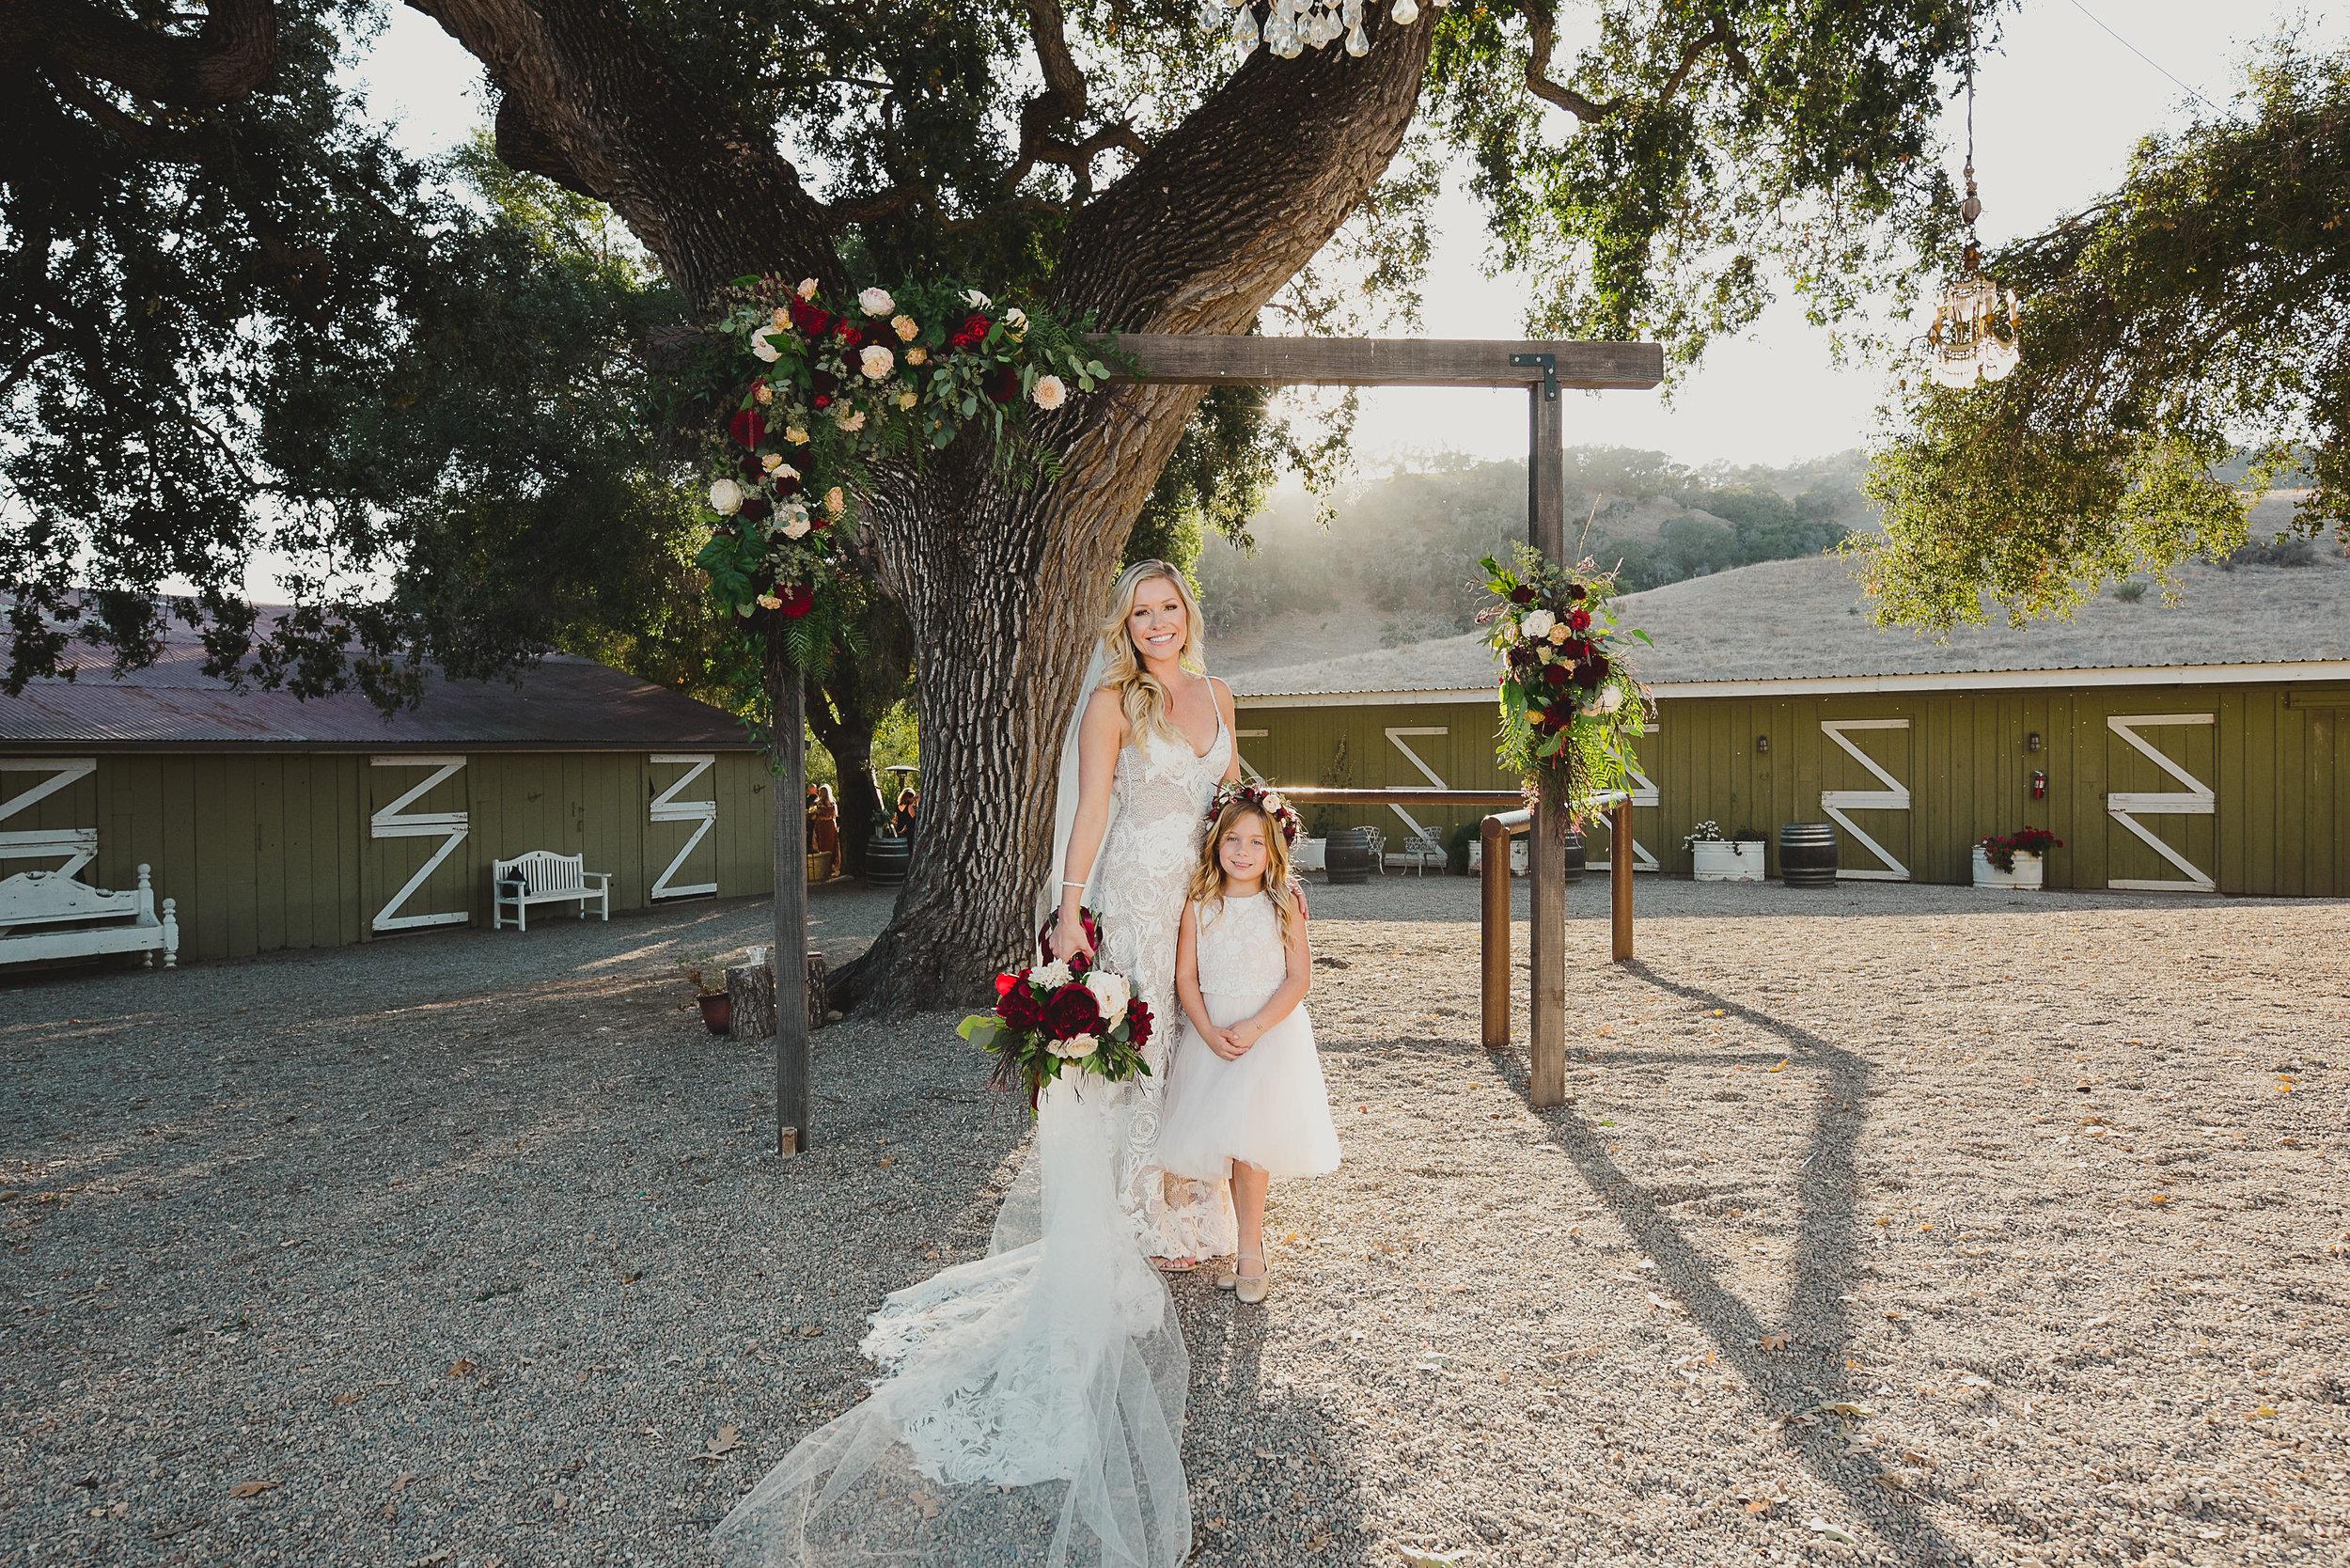 181026-Marisa-JB-Wedding-4653.jpg